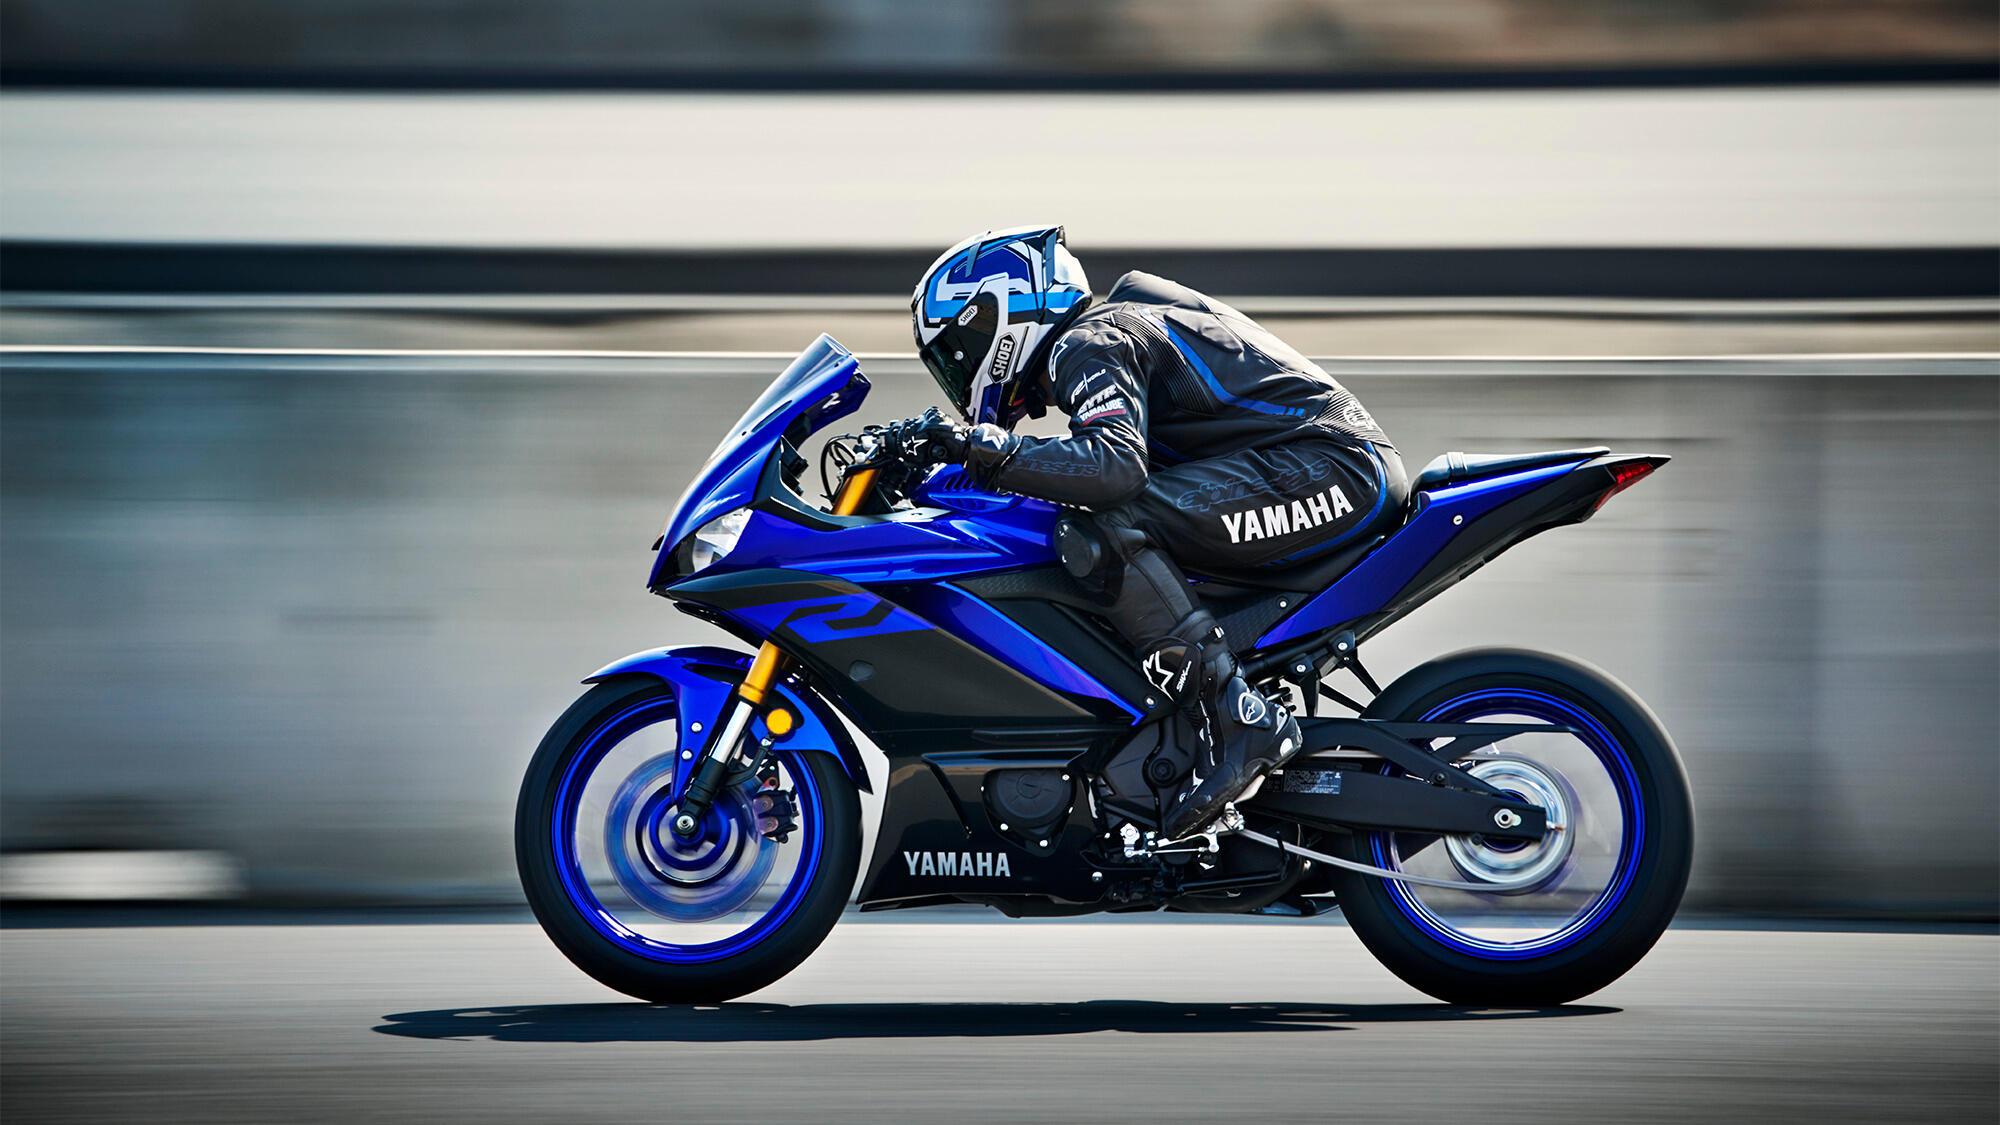 Yzf R3 Motorcycles Yamaha Motor